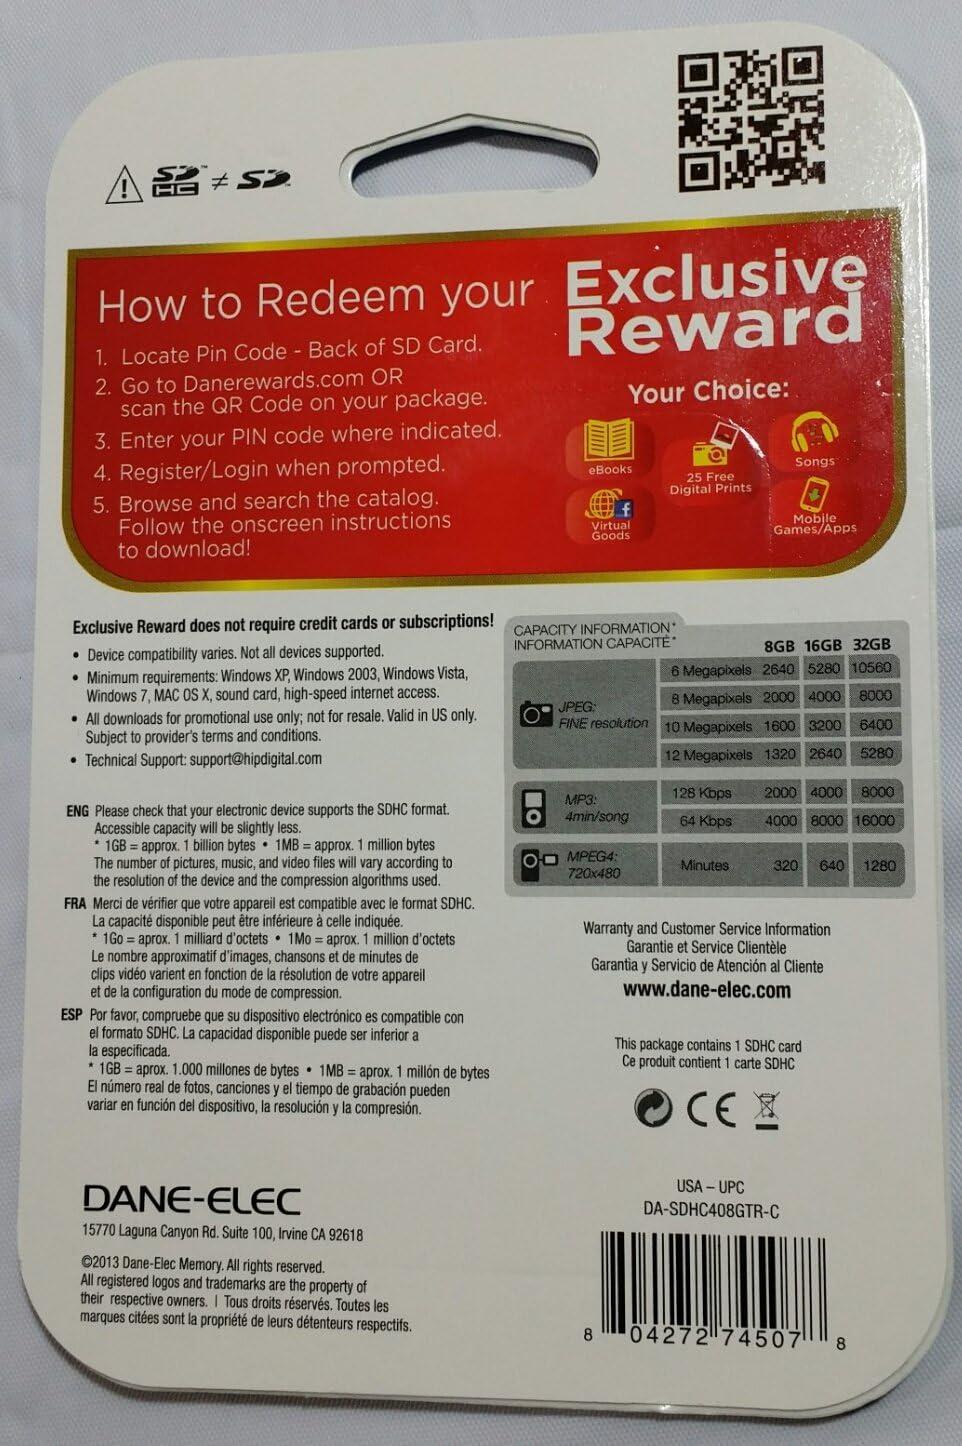 Dane-Elec SDHC High Speed 8GB Exclusive Reward